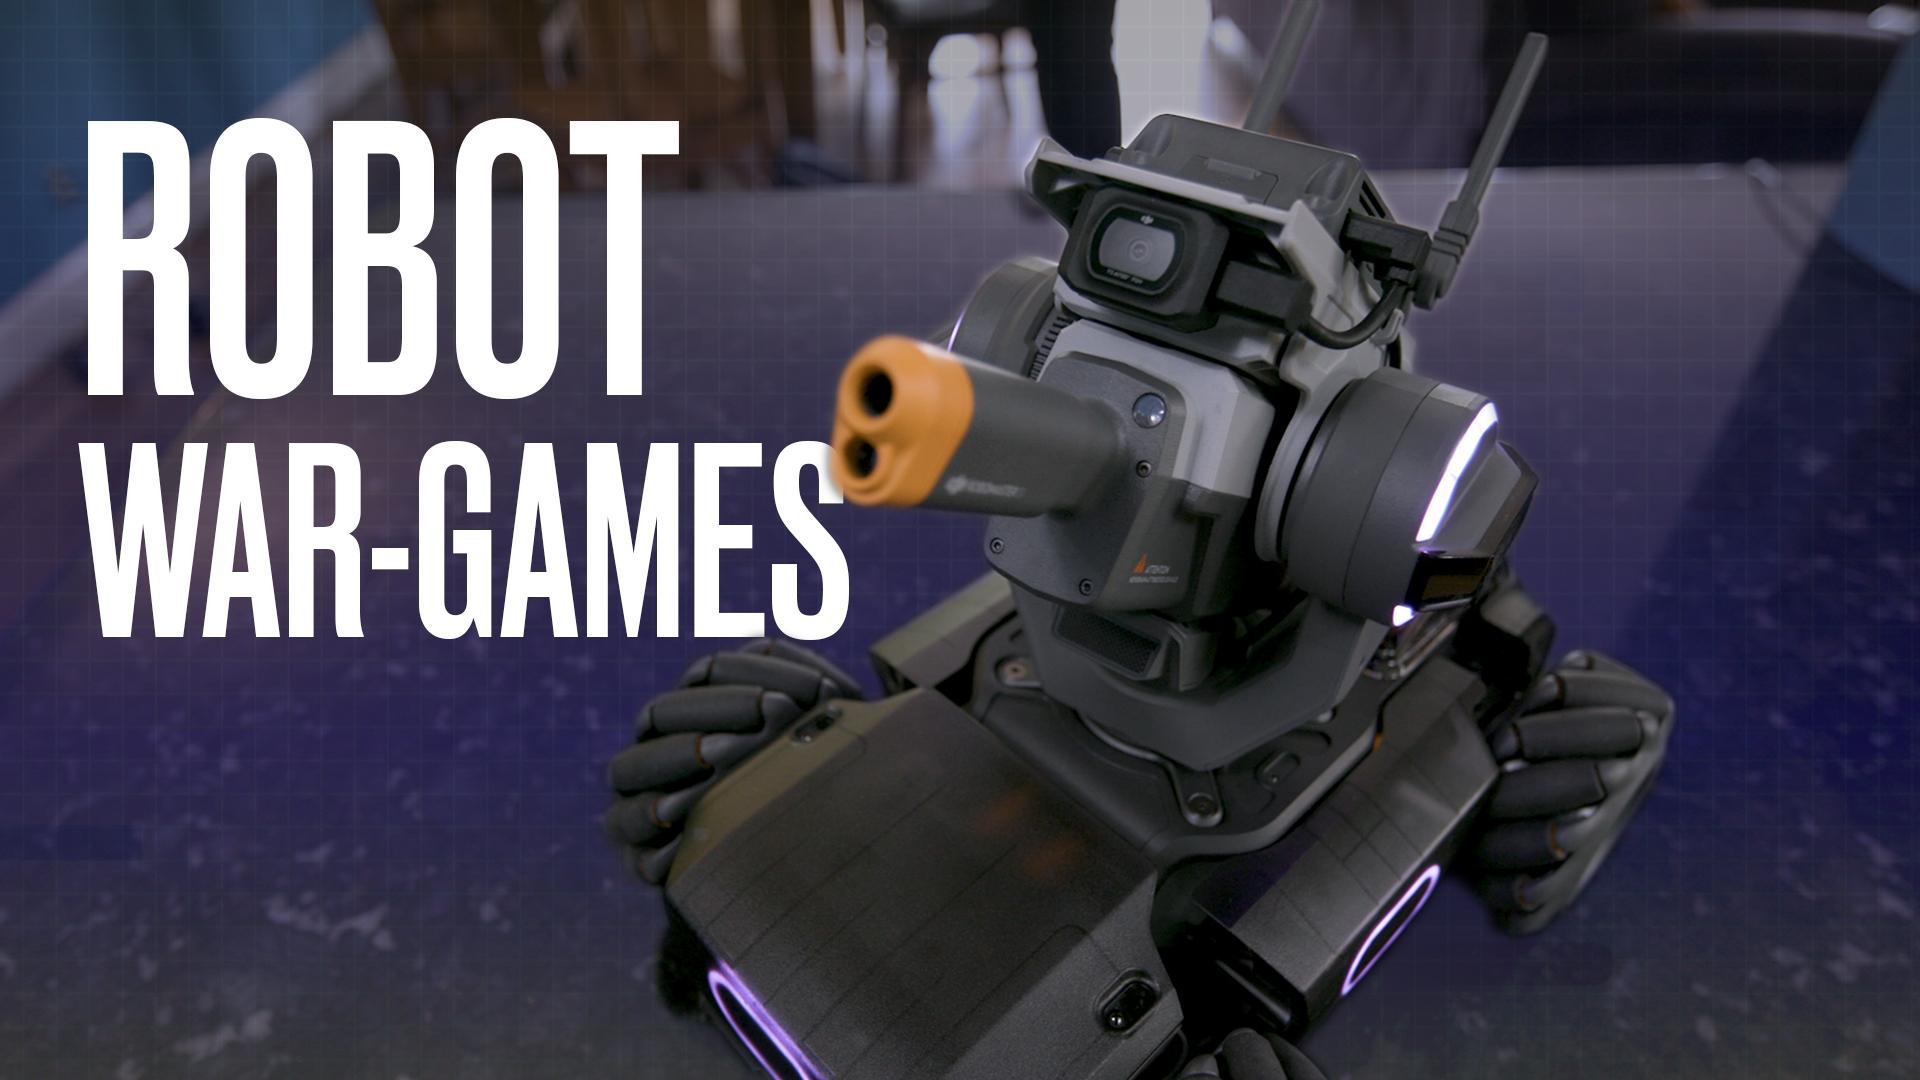 DJI Robotics, Ashlee Vance, Hello World, SZ DJI Technology